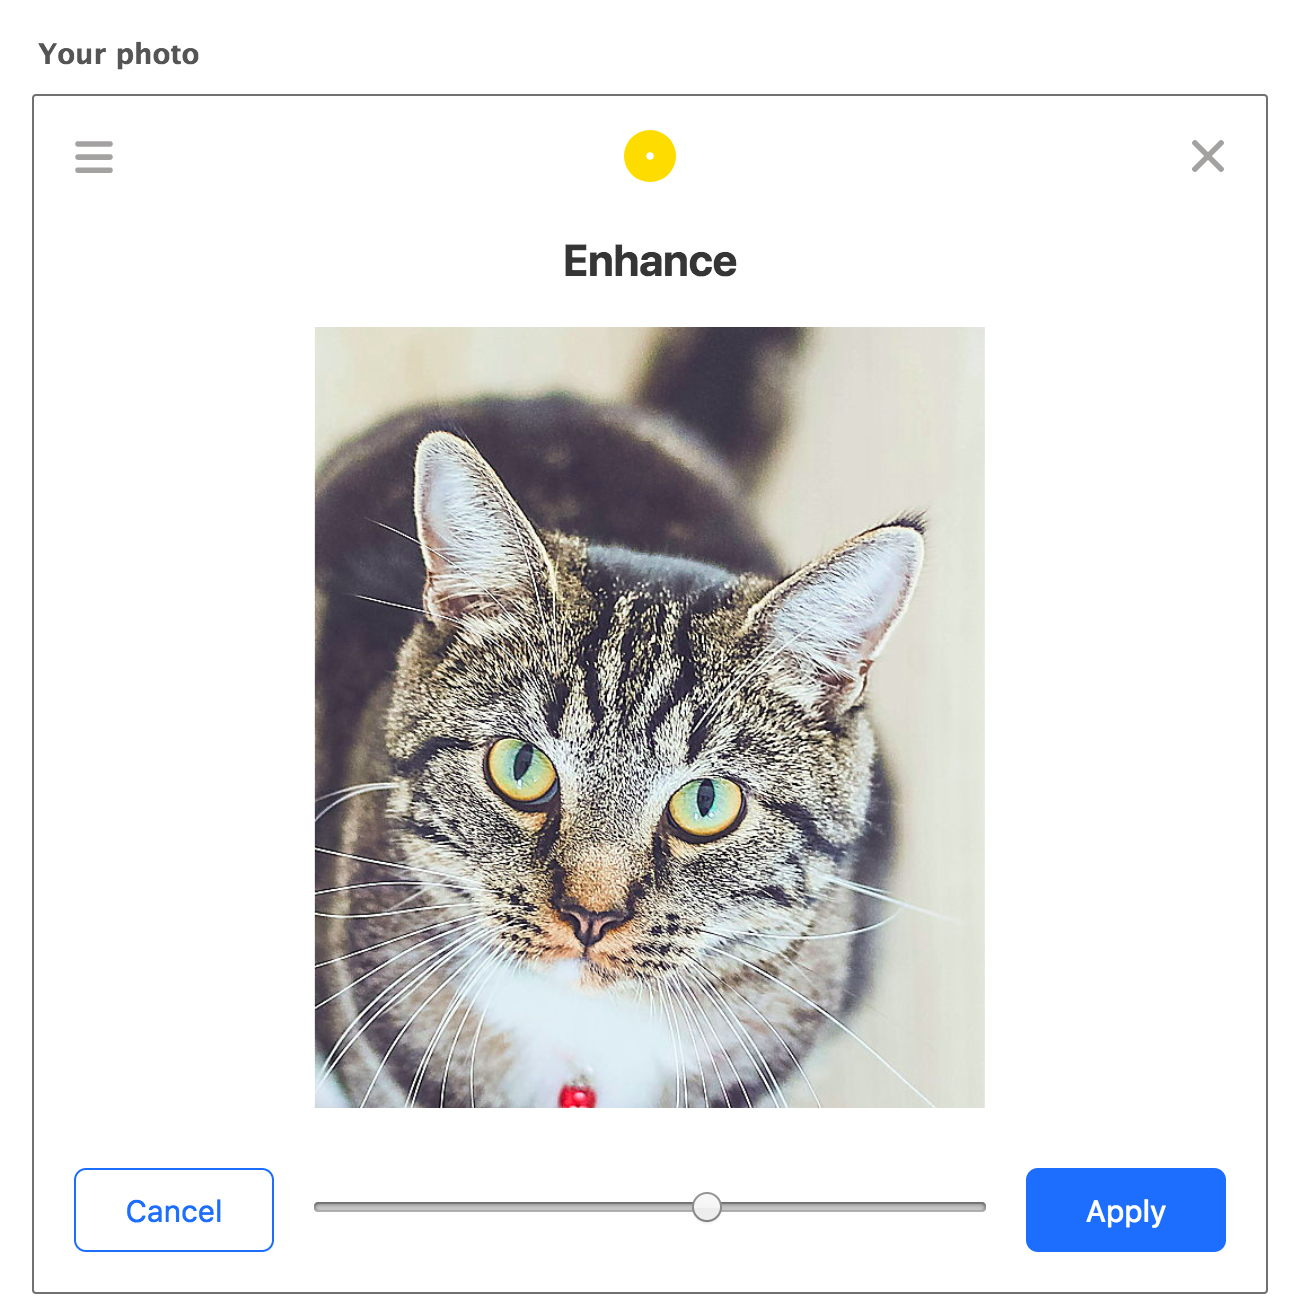 Processed image, enhance